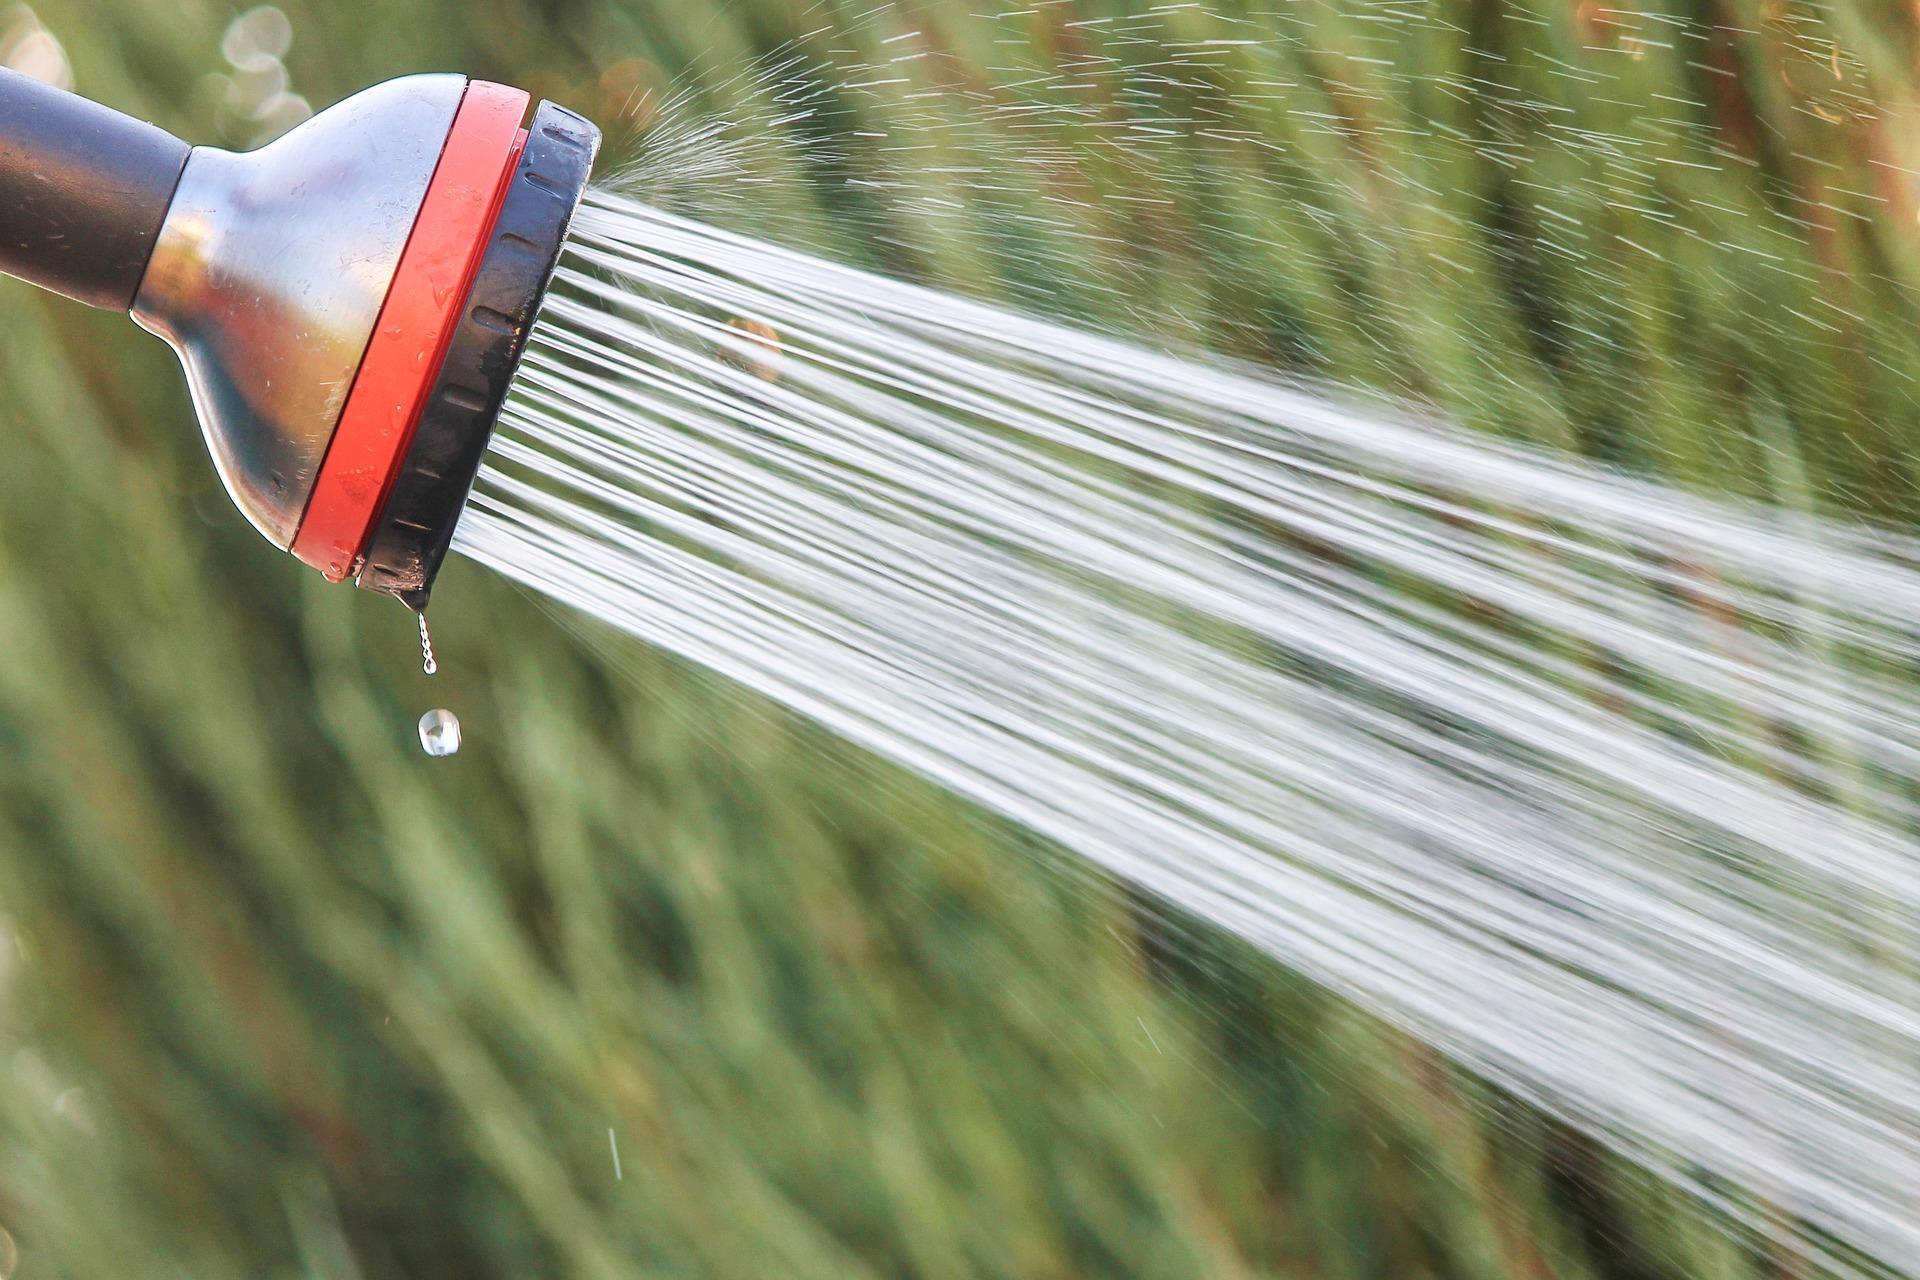 Water Jet – bild av Manfred Richter från Pixabay.